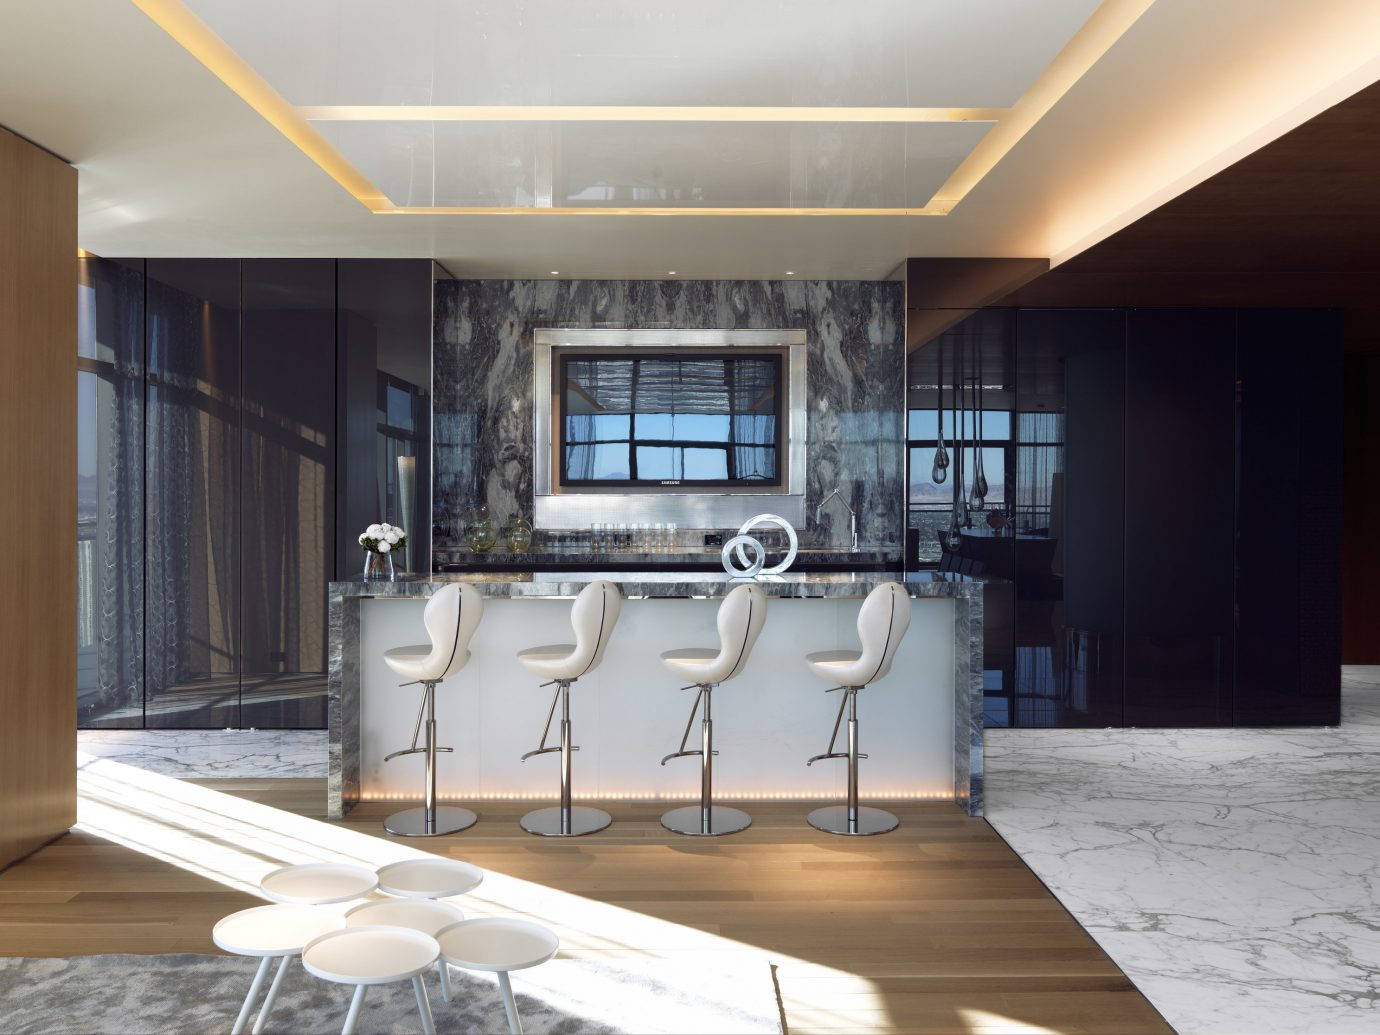 Hotels Luxury Travel Travel Tips indoor ceiling floor interior design room wall Architecture living room furniture table Lobby interior designer loft apartment house